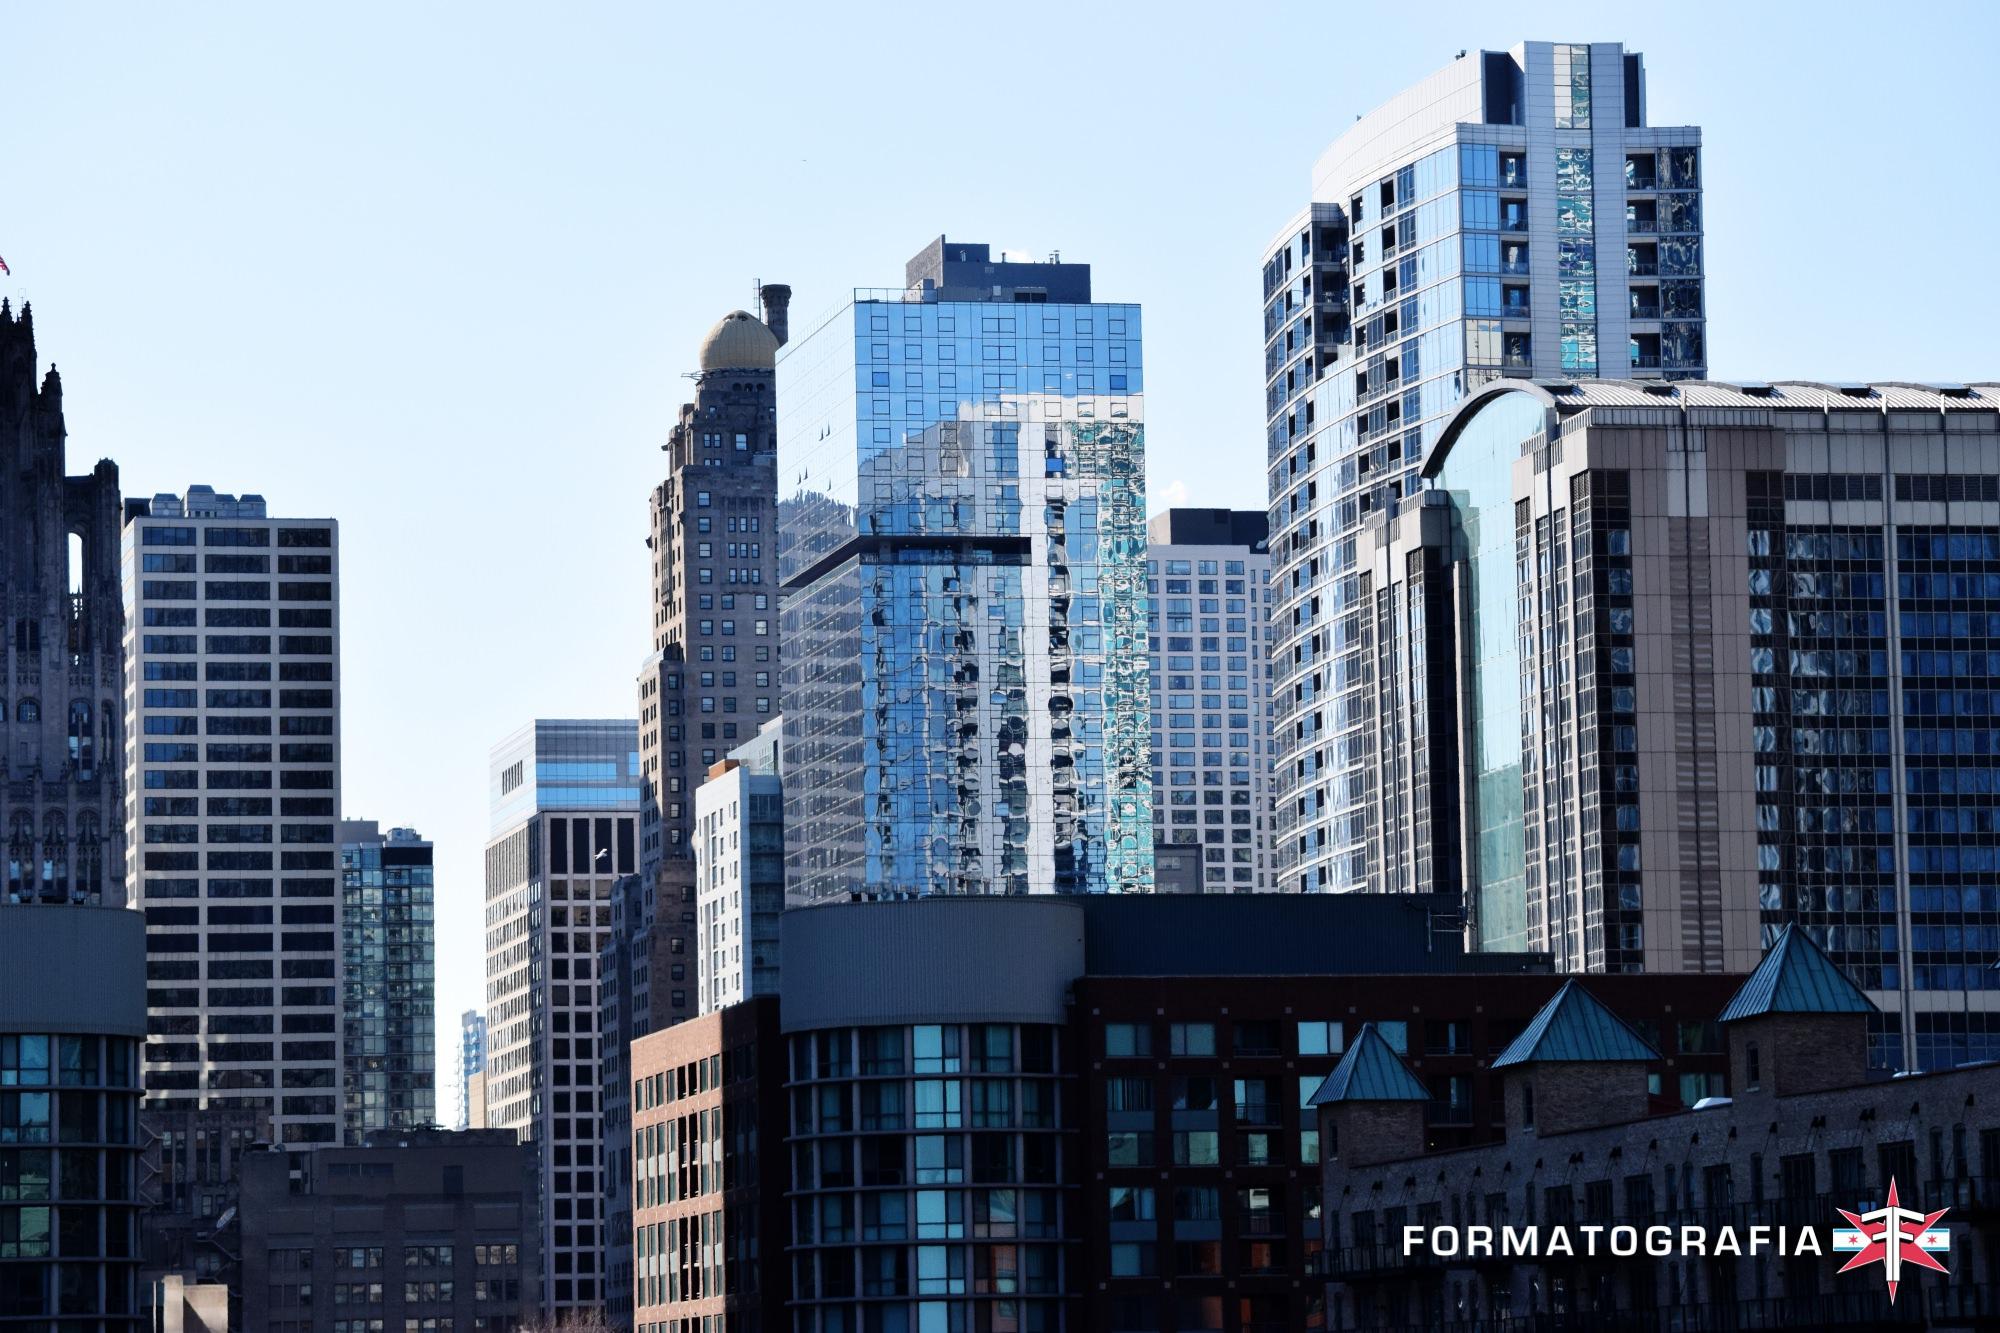 eric formato chicago photographer fall update city architecture shotsDSC_0115_tonemapped.jpg